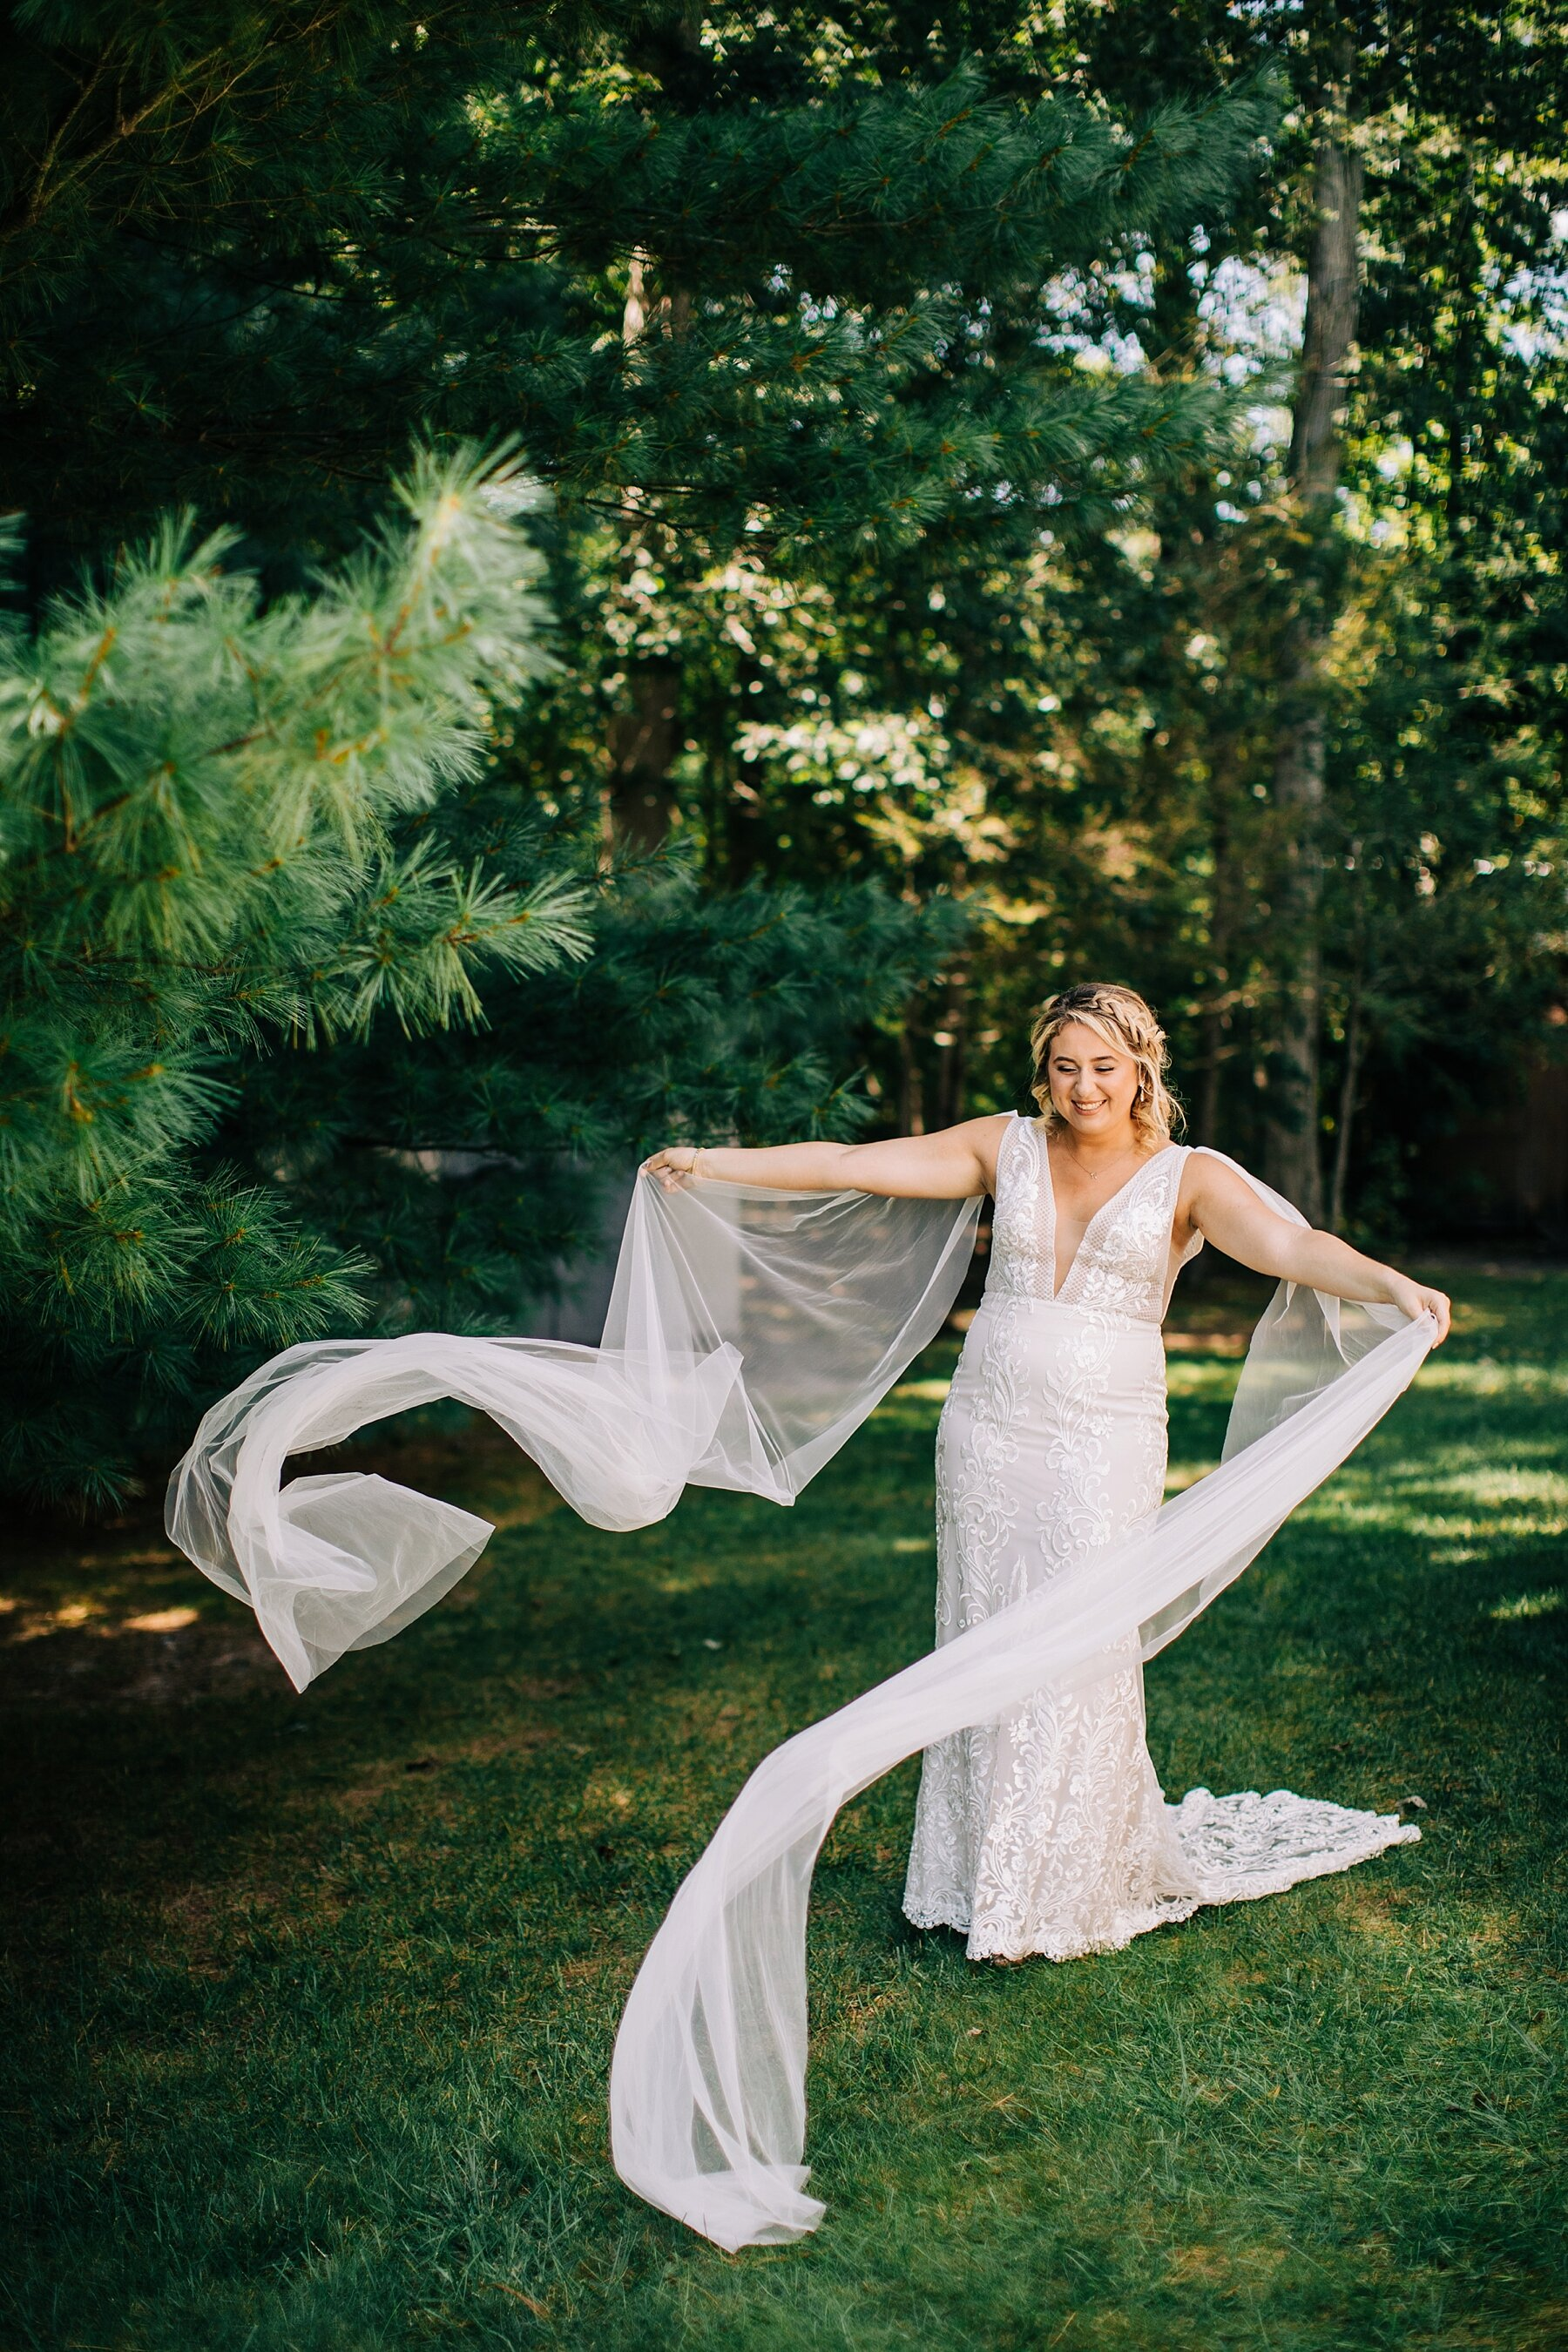 the-mill-lakeside-manor-spring-lake-wedding-photographer_0006.jpg